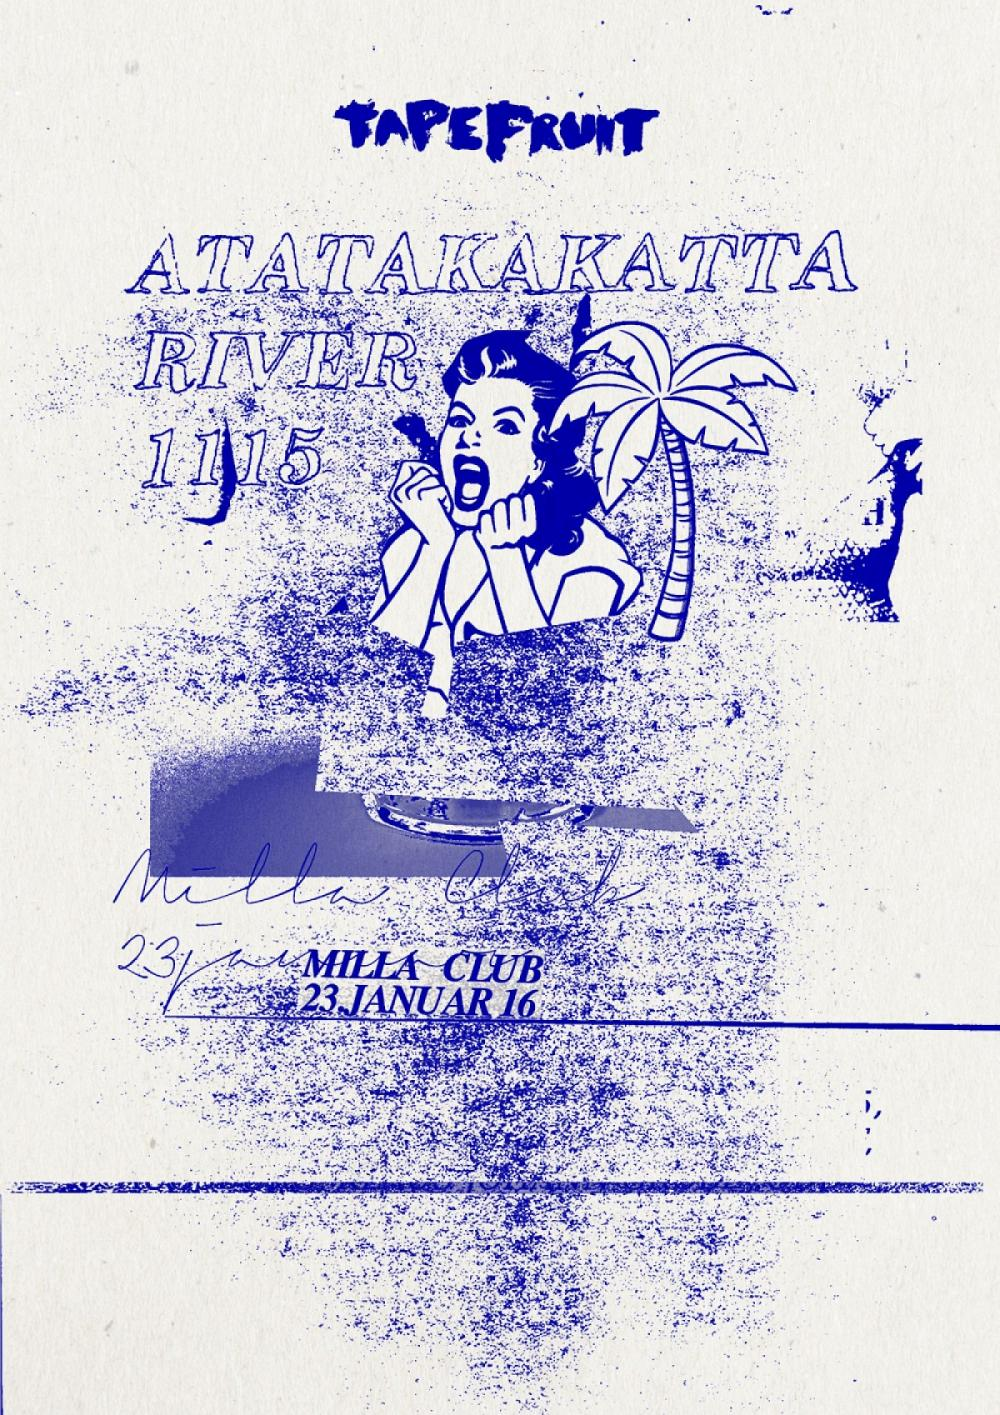 Tapefruit Konzert: Atatakakatta + River + 1115 | 23.01.2016 @ Milla Club